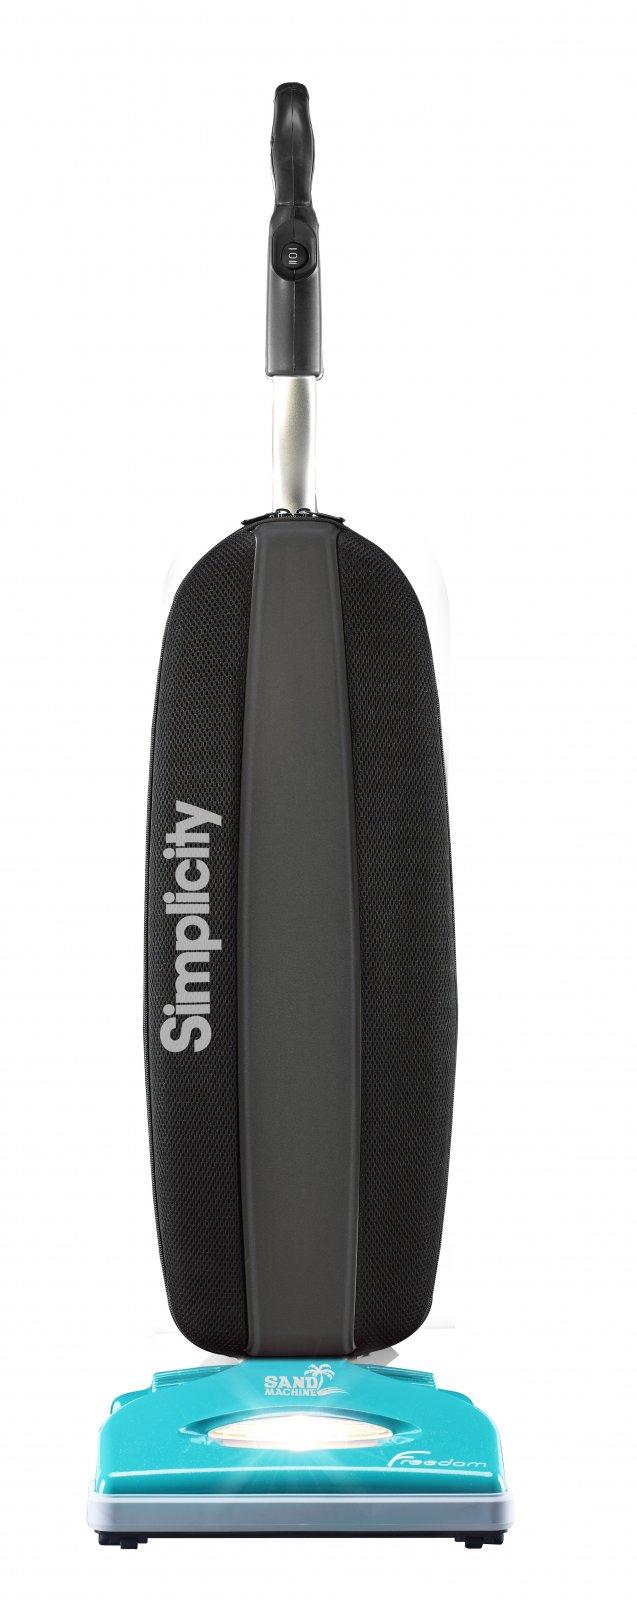 Simplicity Freedom S10SAND - Lightweight Upright